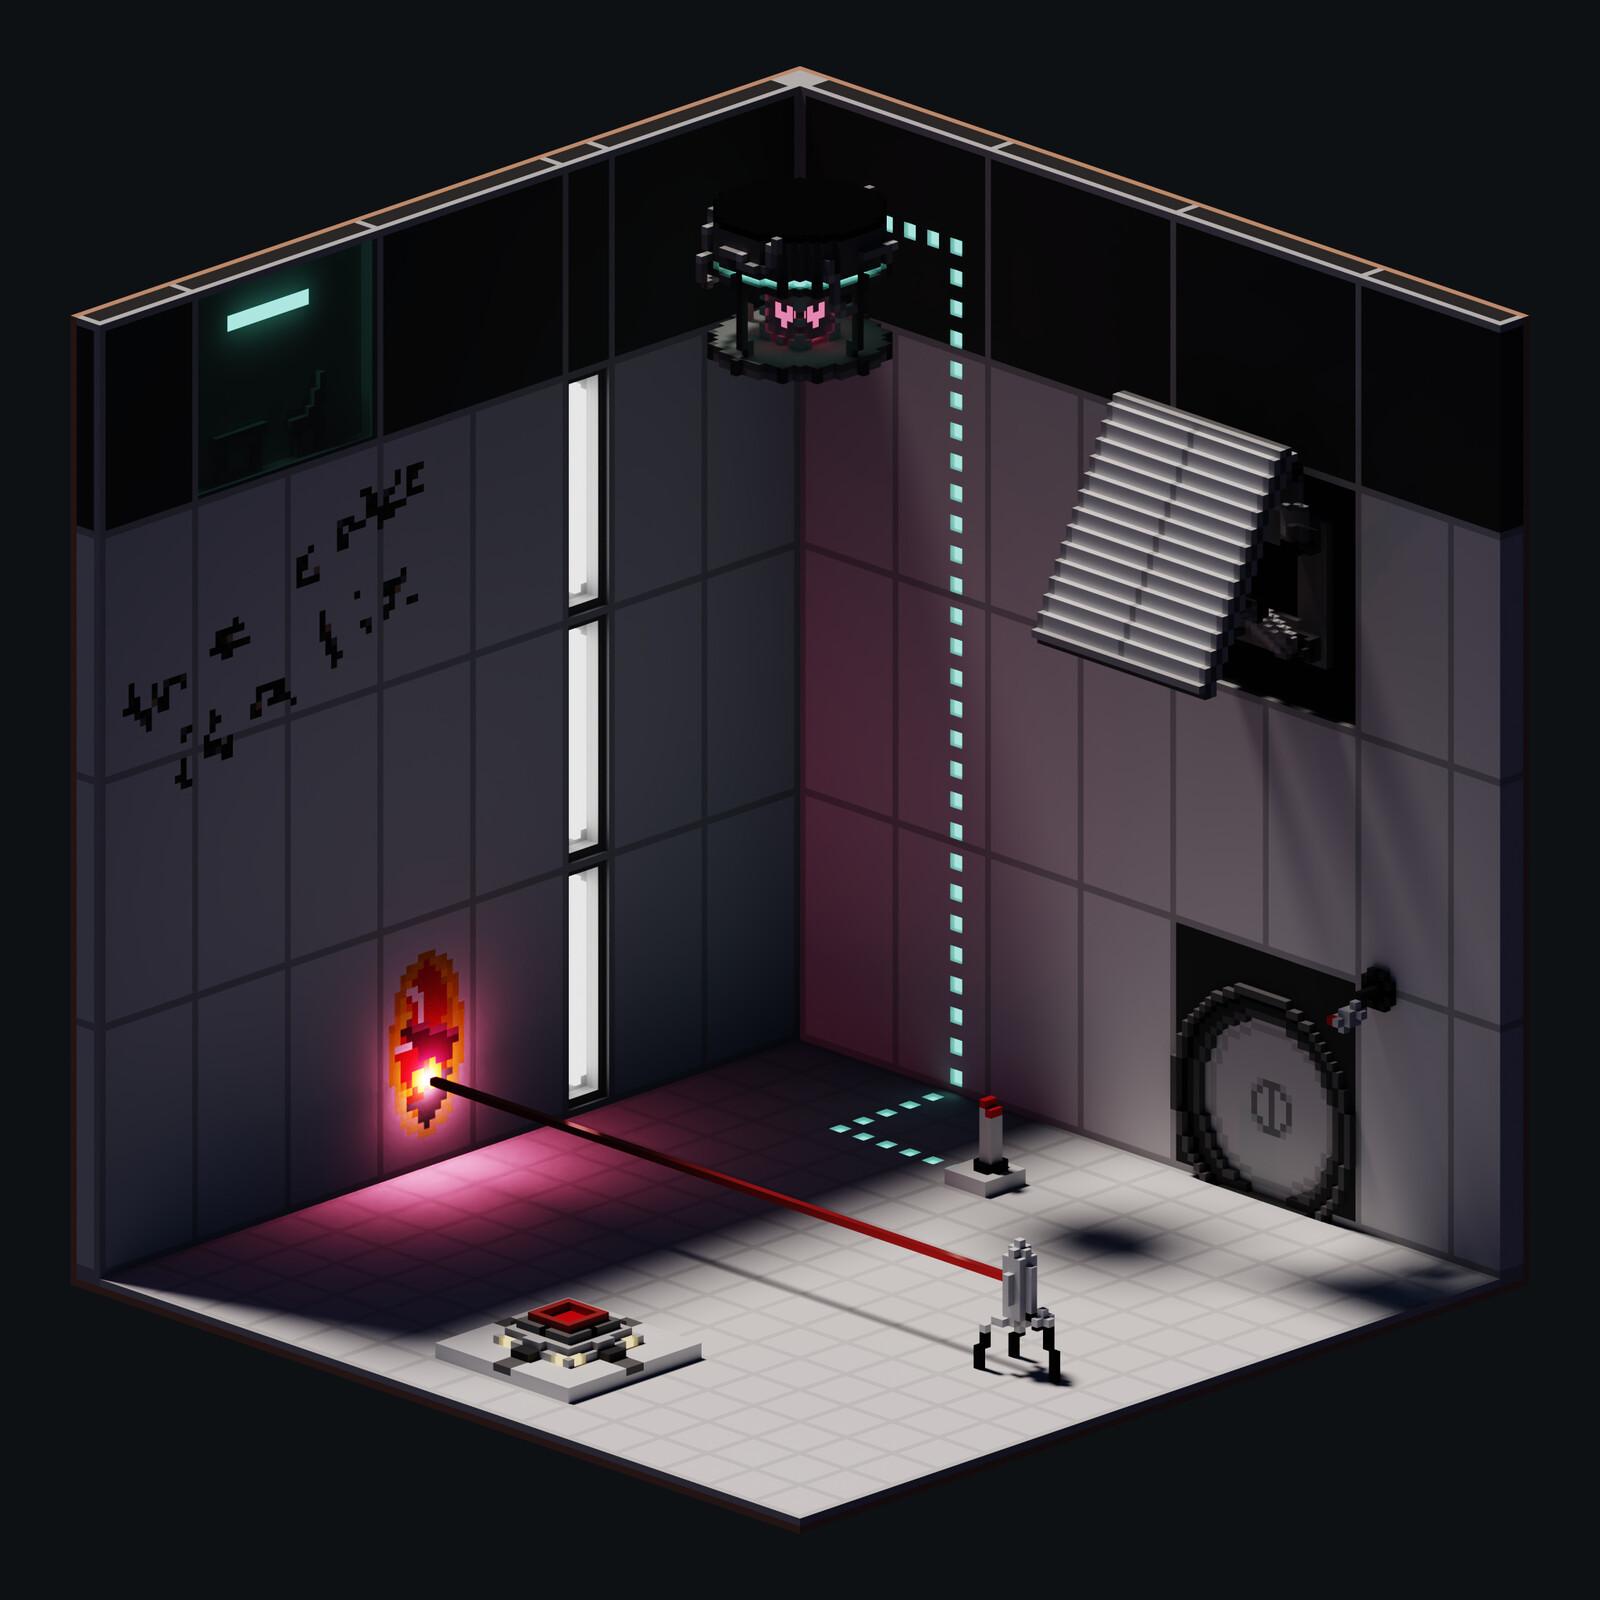 One Room: Portal 2